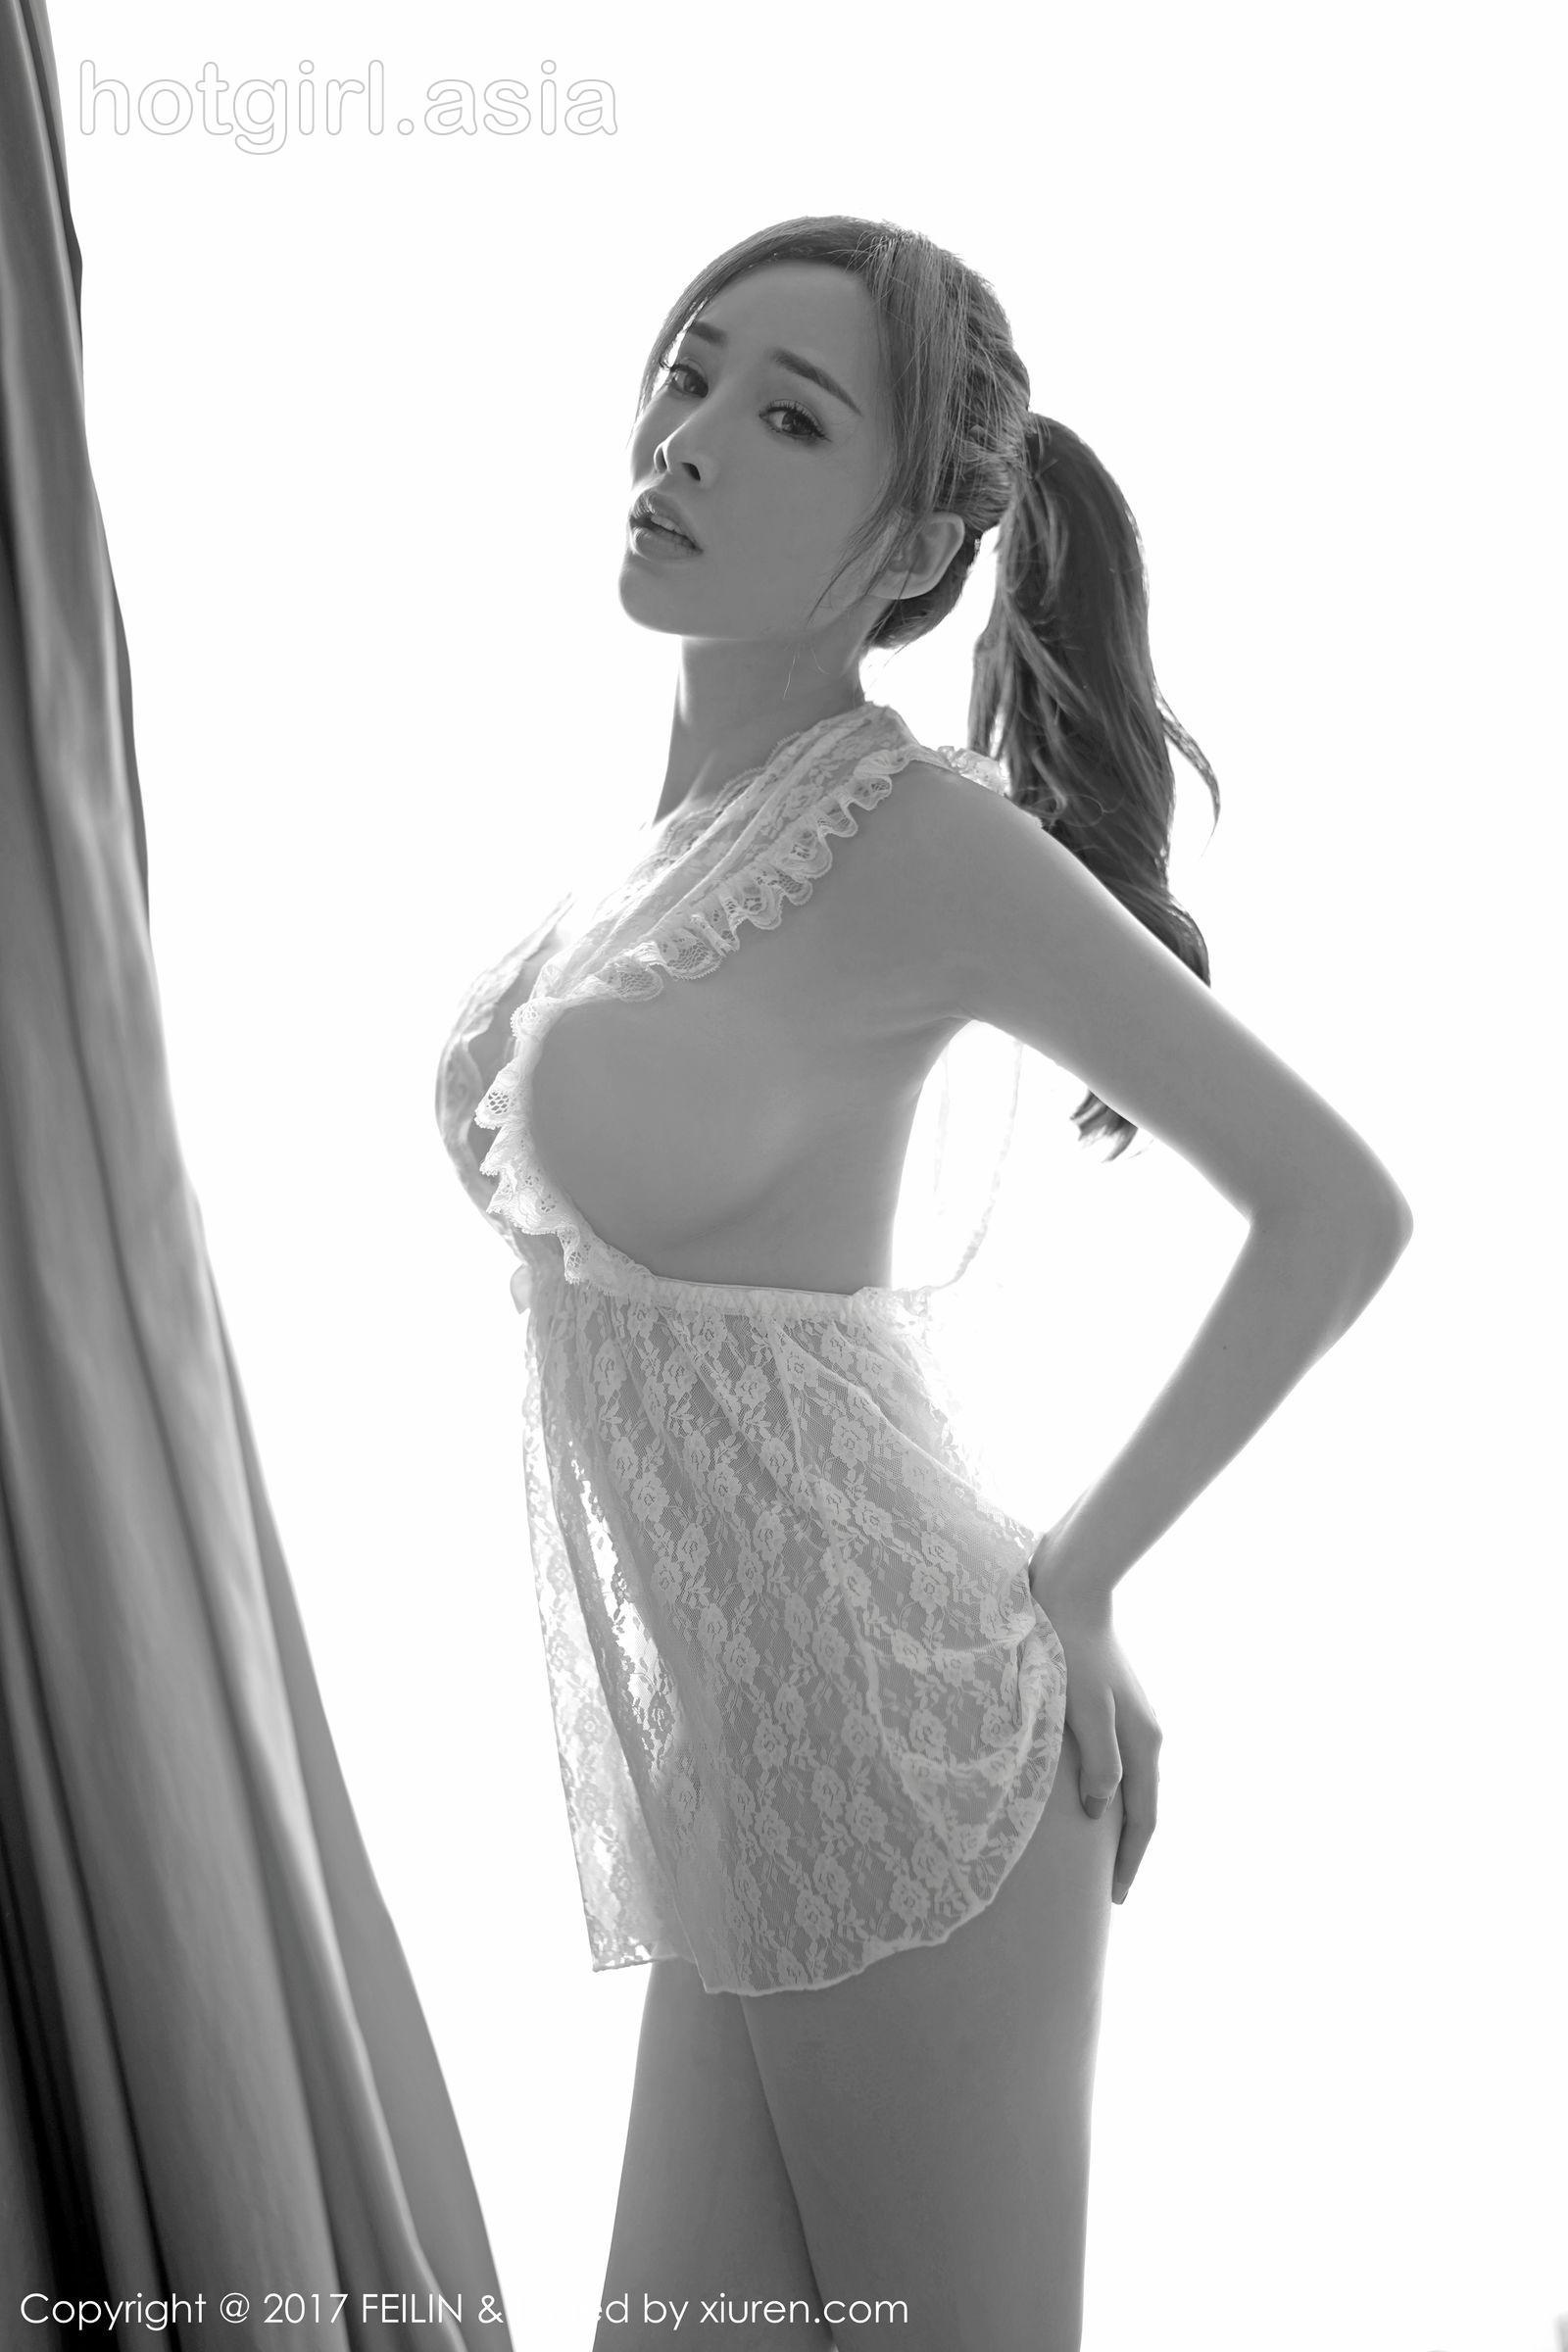 [FEILIN 囲 囡囡] VOL.111 Goddess @ 土肥 圆 短 屁 穷 Latest sexy photo